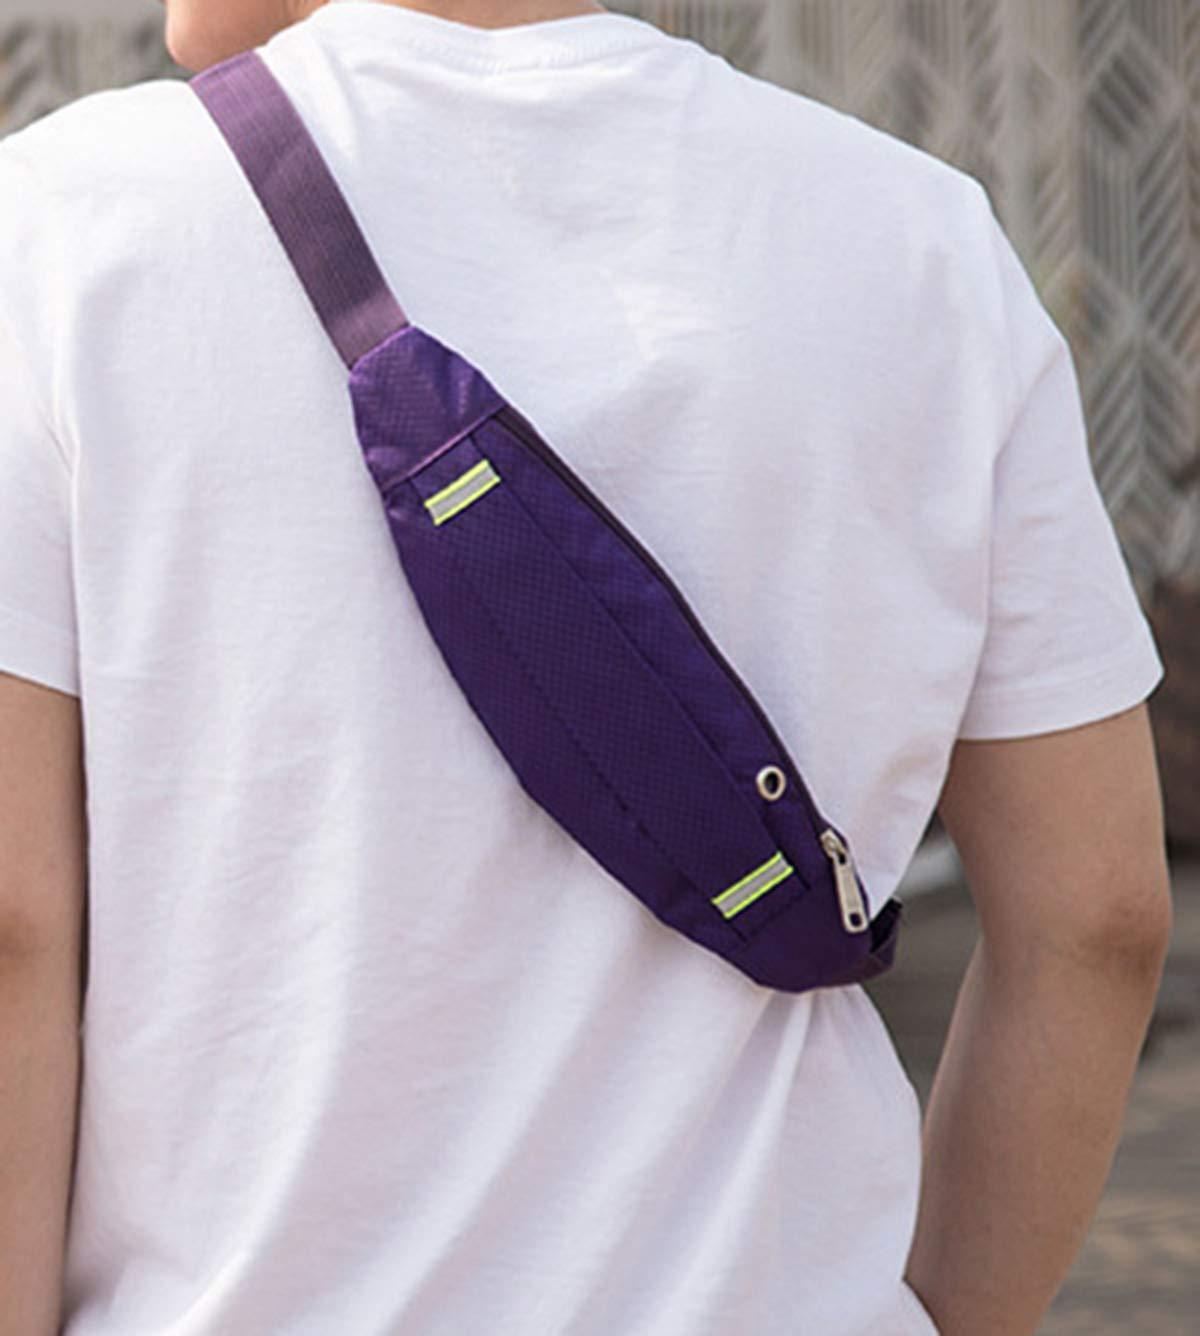 skudy Impermeable paño de Oxford riñonera con Toma para Auriculares Mini Bolsa de Gimnasio para Hombre Mujer Portátil Sling Bag, Violeta: Amazon.es: ...